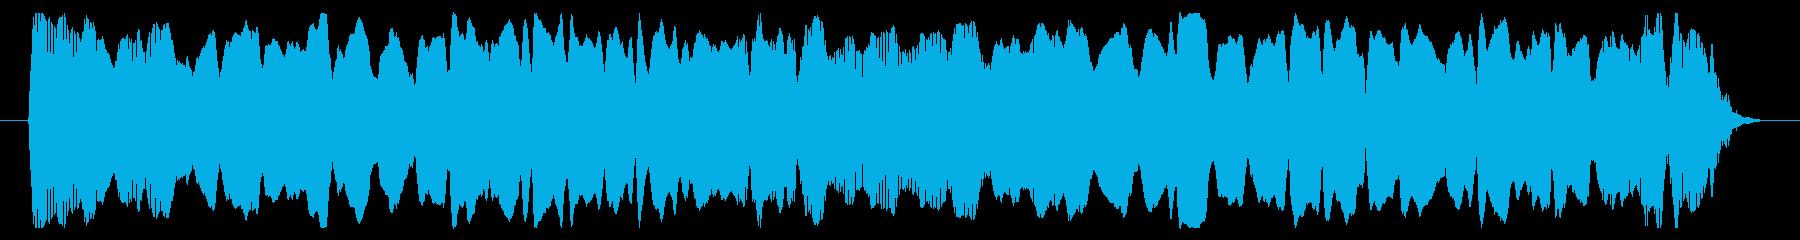 8bitパワーU-D-01-4_dryの再生済みの波形